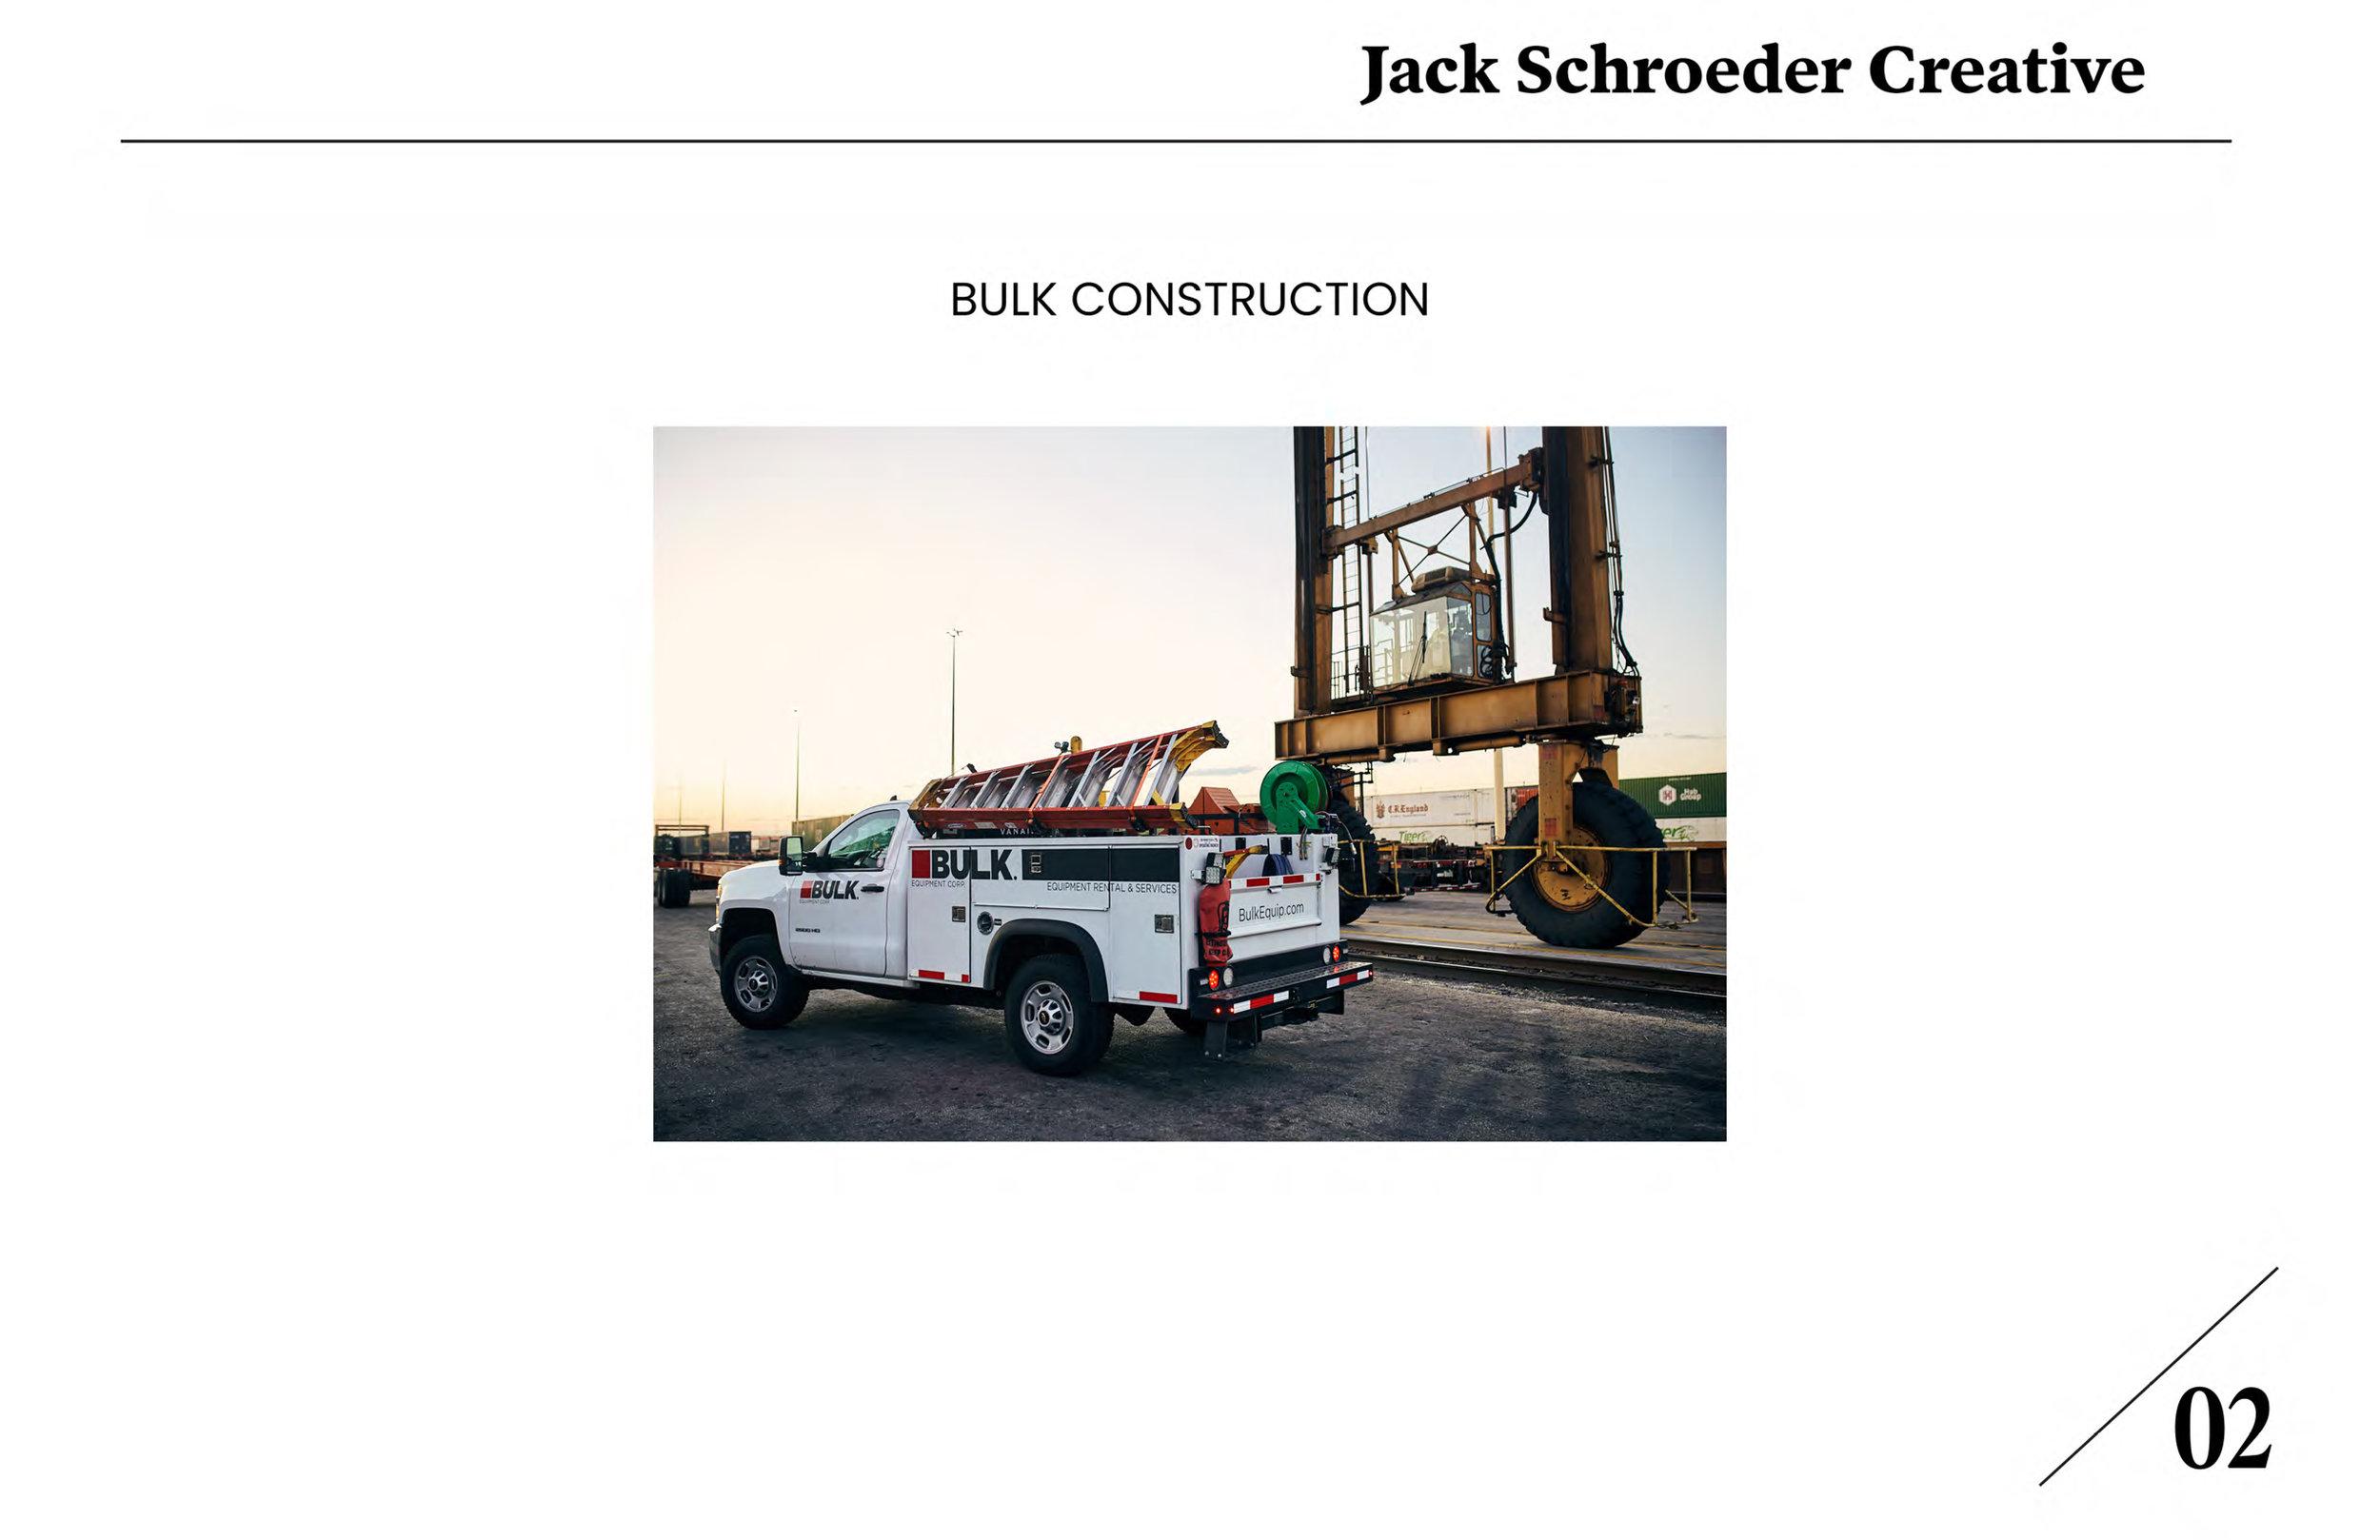 JackSchroederPhotographyTreatment-18.jpg